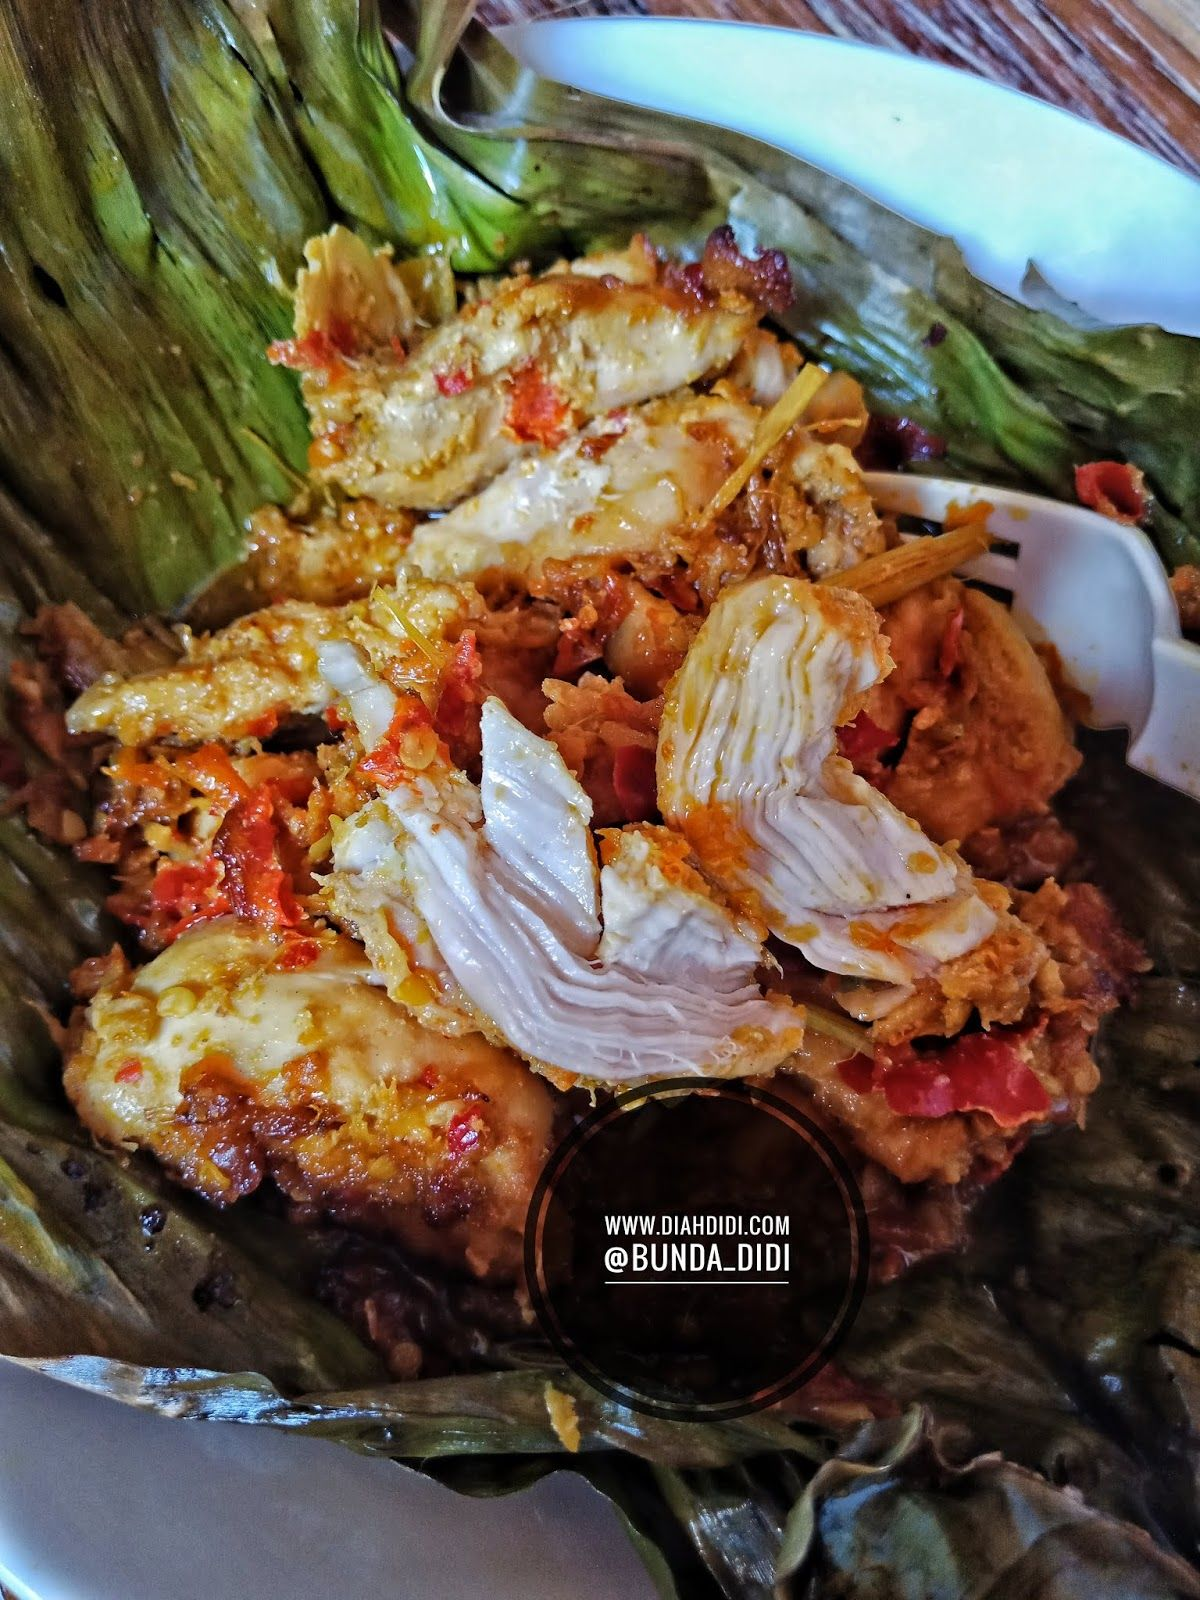 Blog Diah Didi Berisi Resep Masakan Praktis Yang Mudah Dipraktekkan Di Rumah Resep Masakan Resep Masakan Jepang Resep Masakan Indonesia